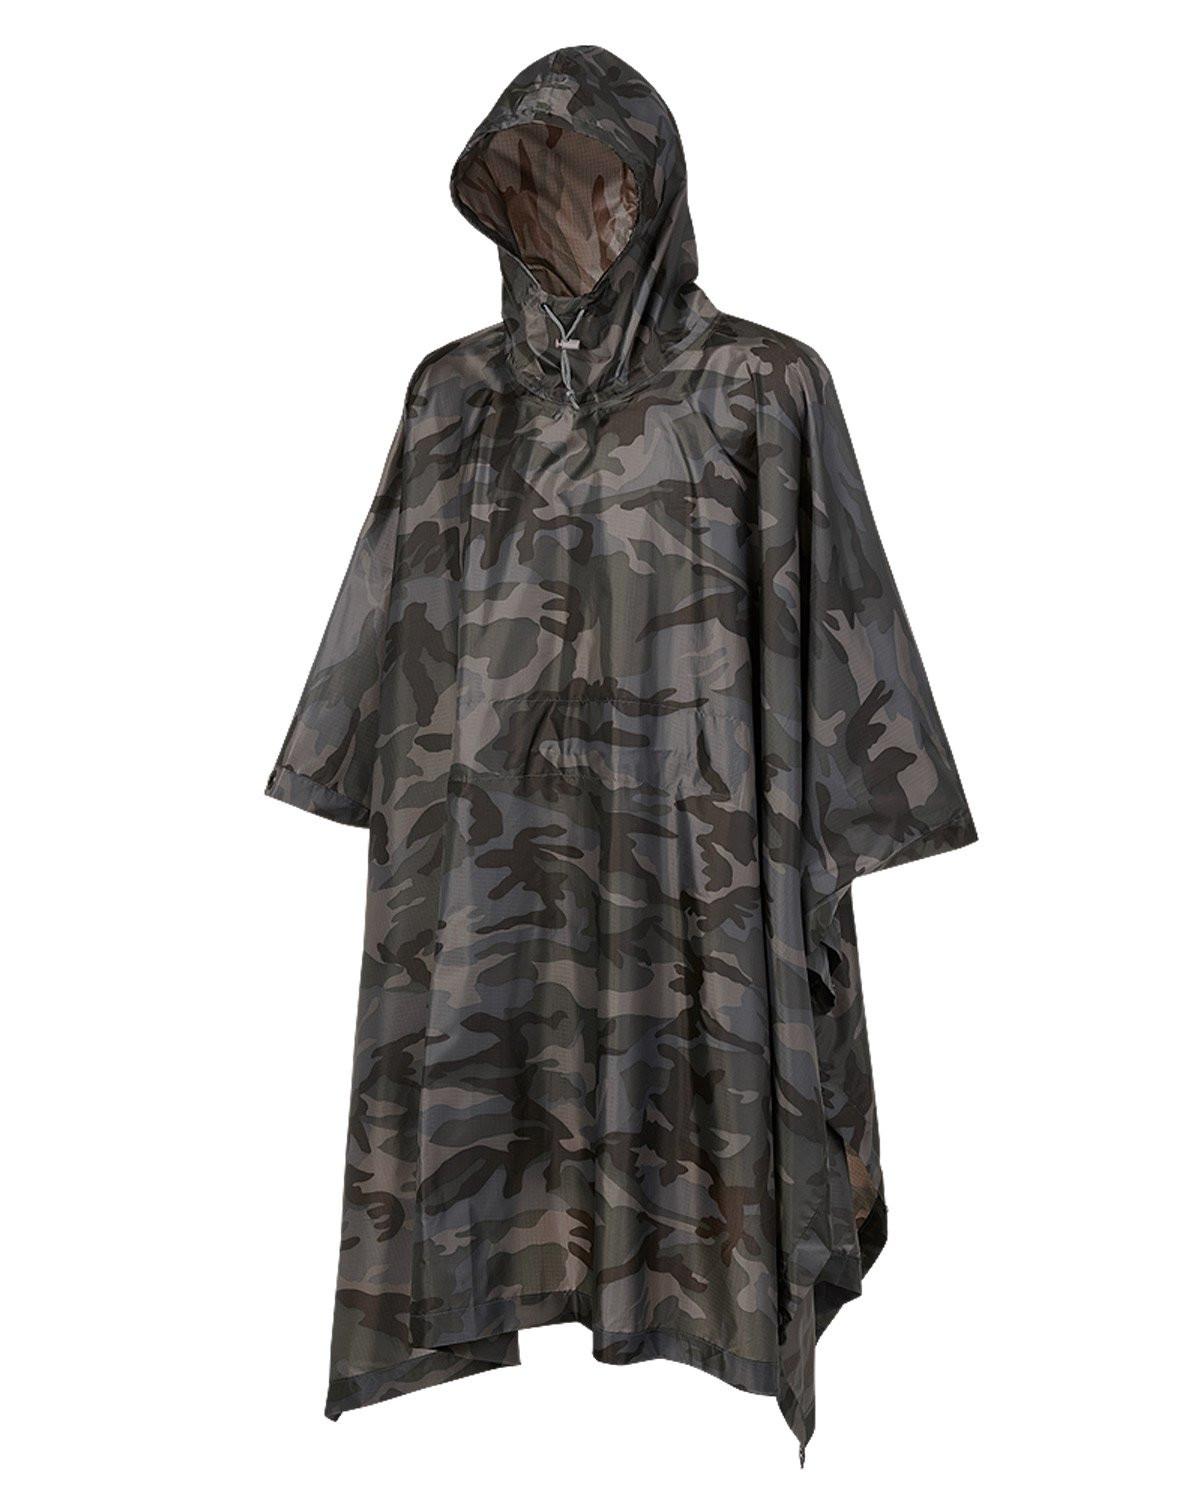 Image of   Brandit Ripstop Poncho (Dark Camo, One Size)